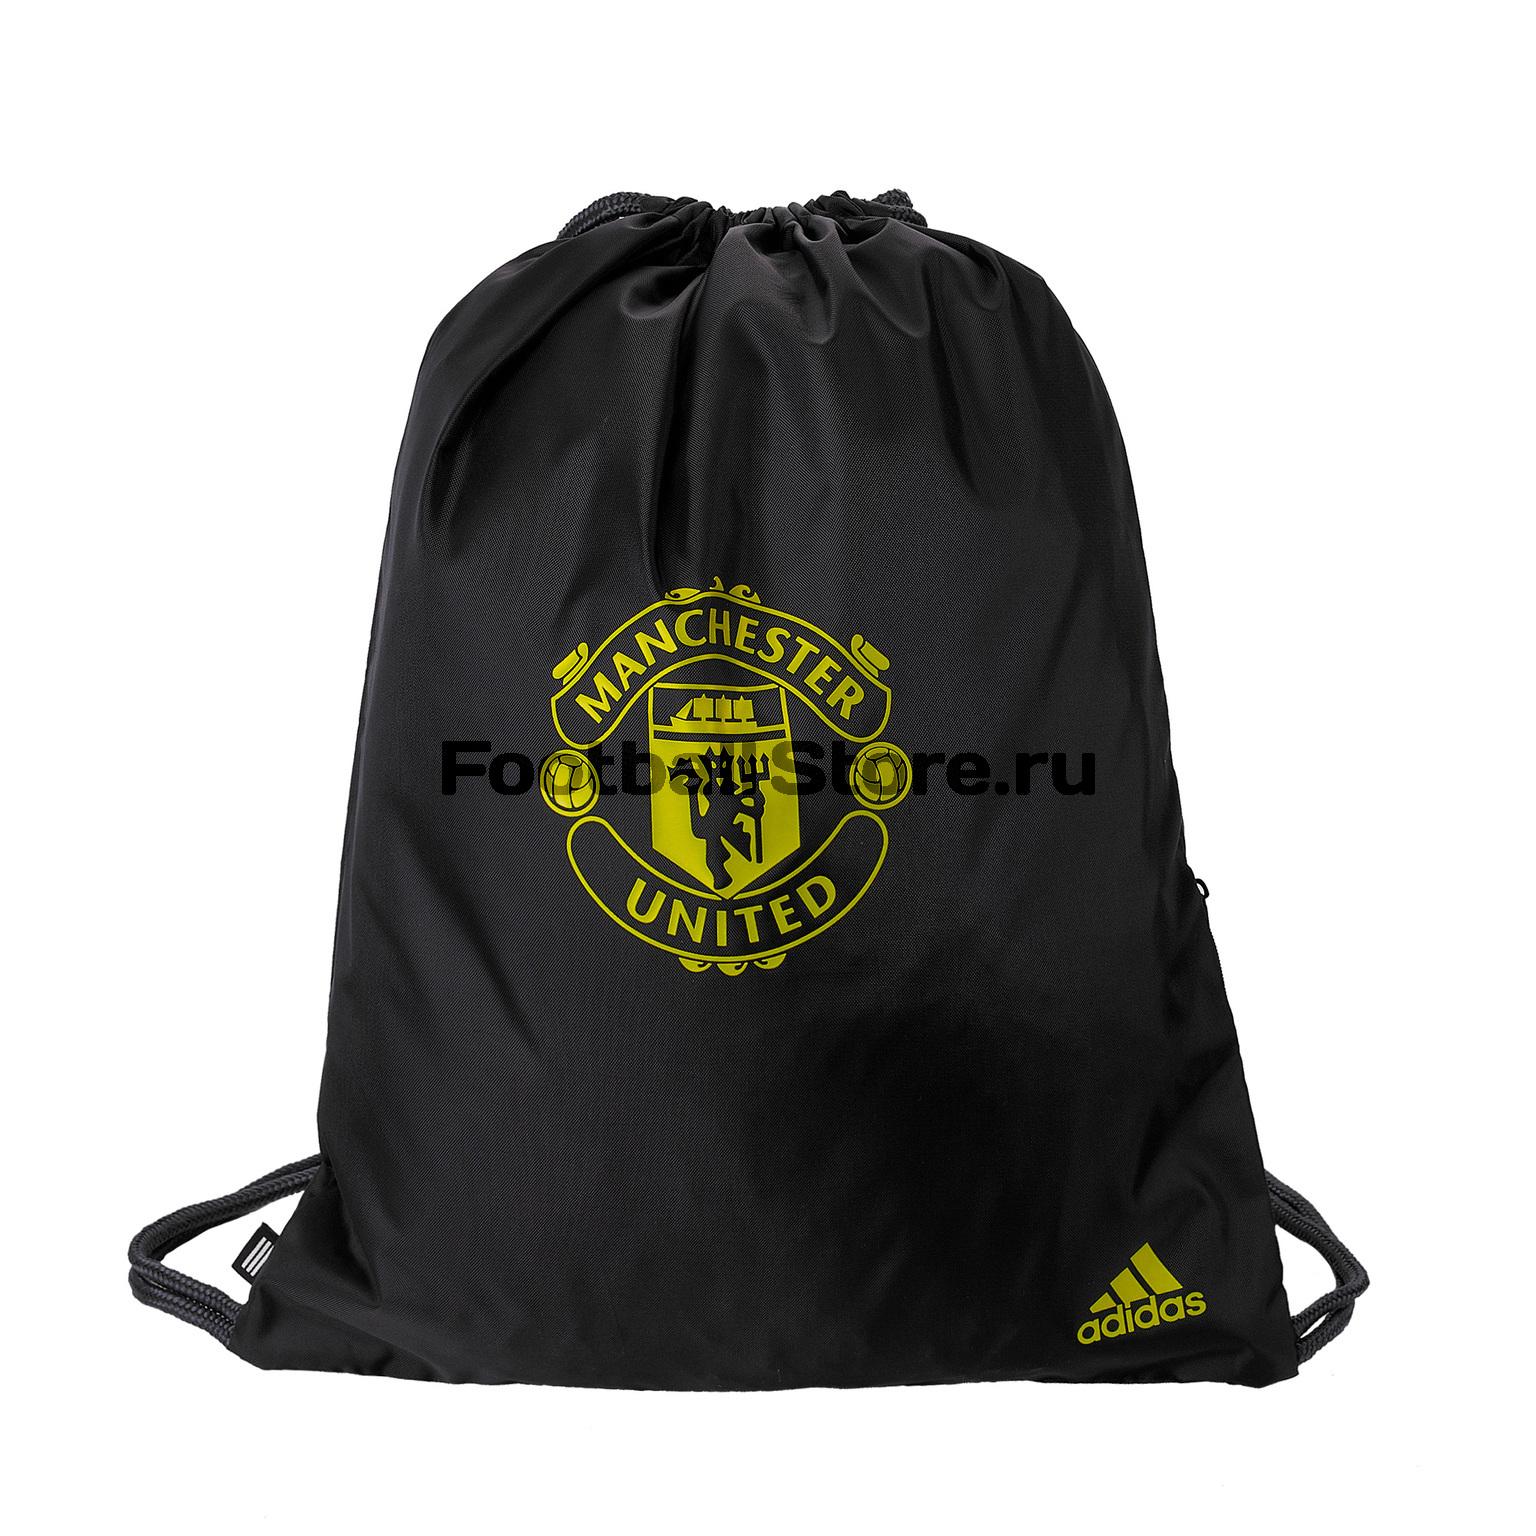 Сумка для обуви Adidas Manchester United DY7689 шарф болельщика adidas manchester united scarf cy5578